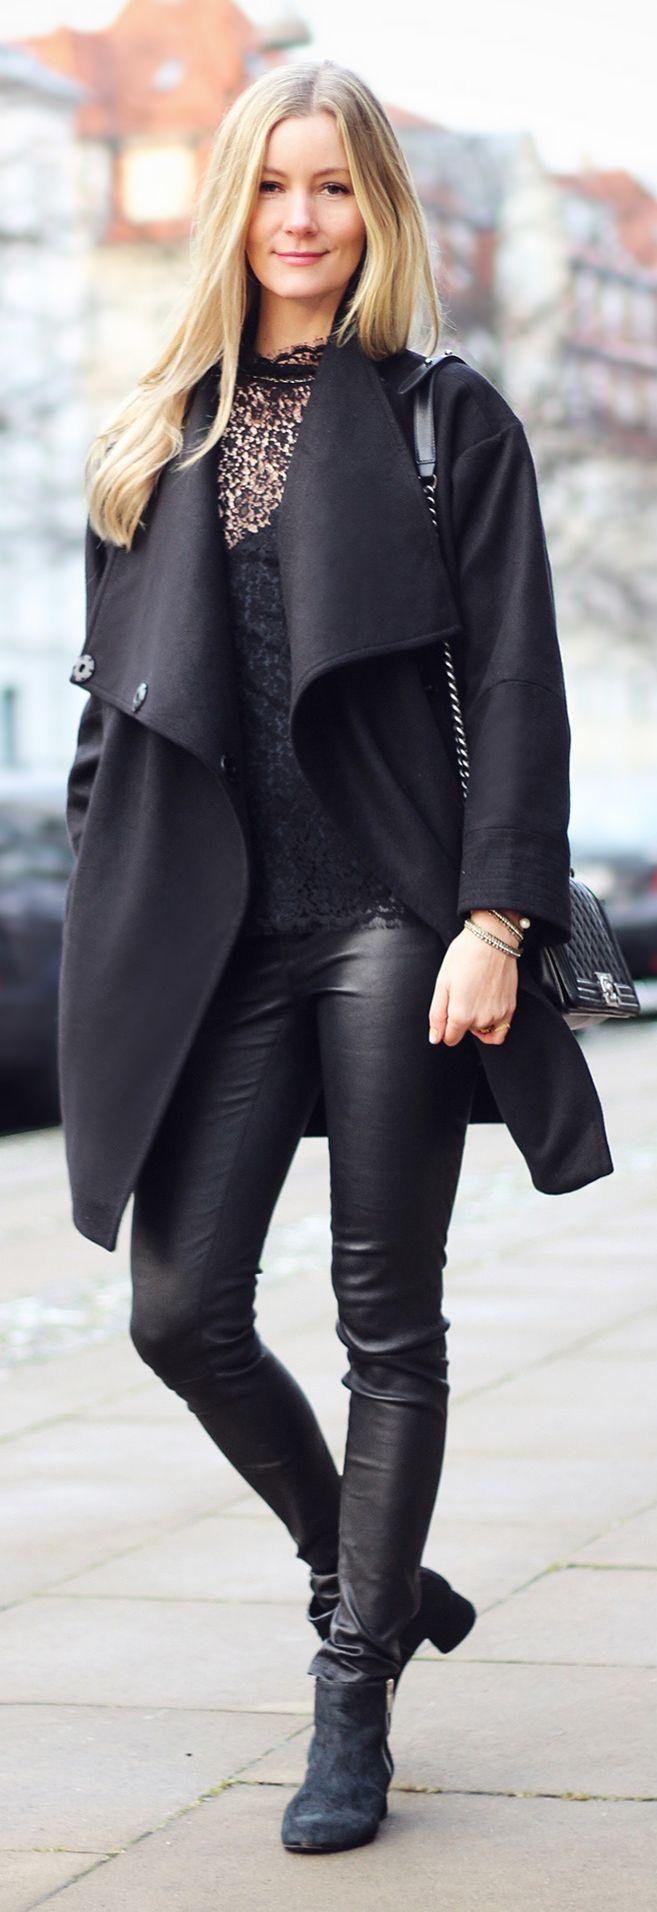 Passions For Fashion Black Drape Front Peacoat Black Lace Blouse Black Leather Jeans Fall Inspo